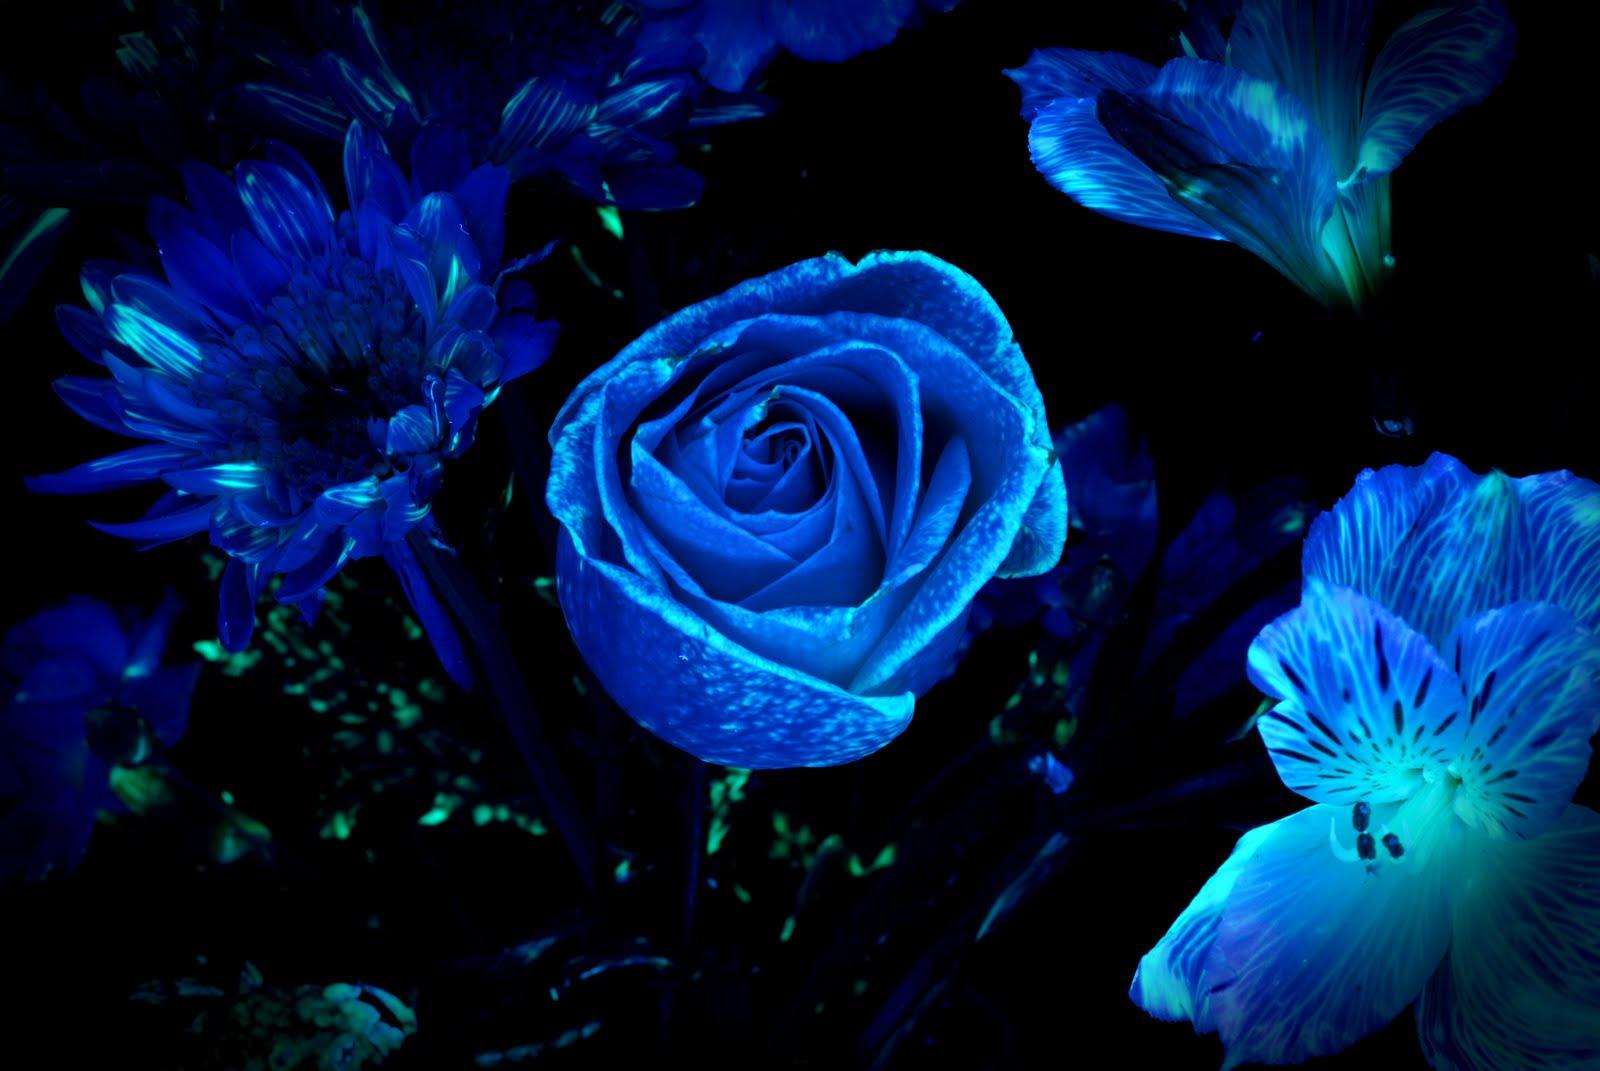 glow dark blue wallpaper - photo #31